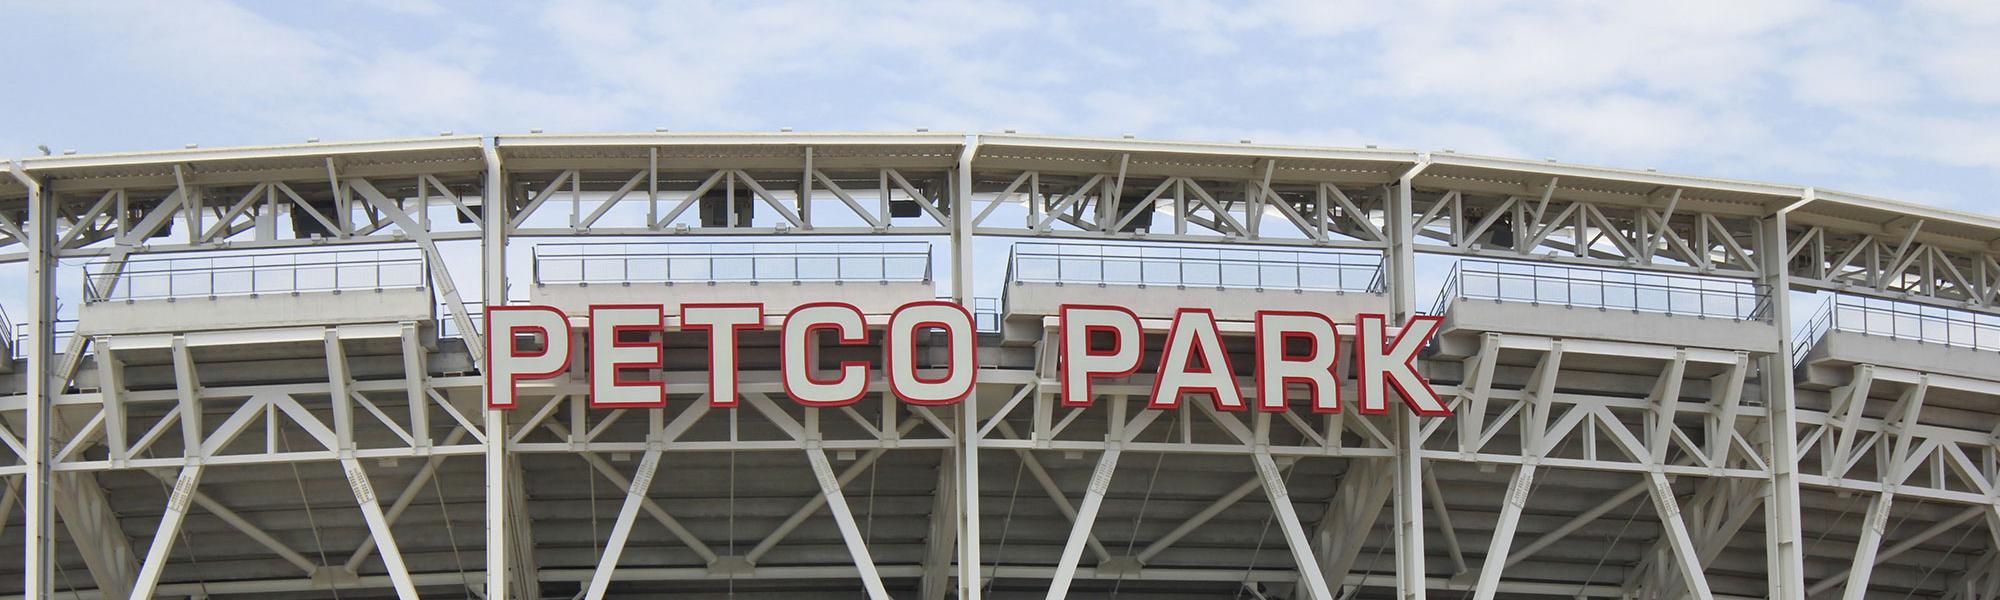 Petco Park in San Diego